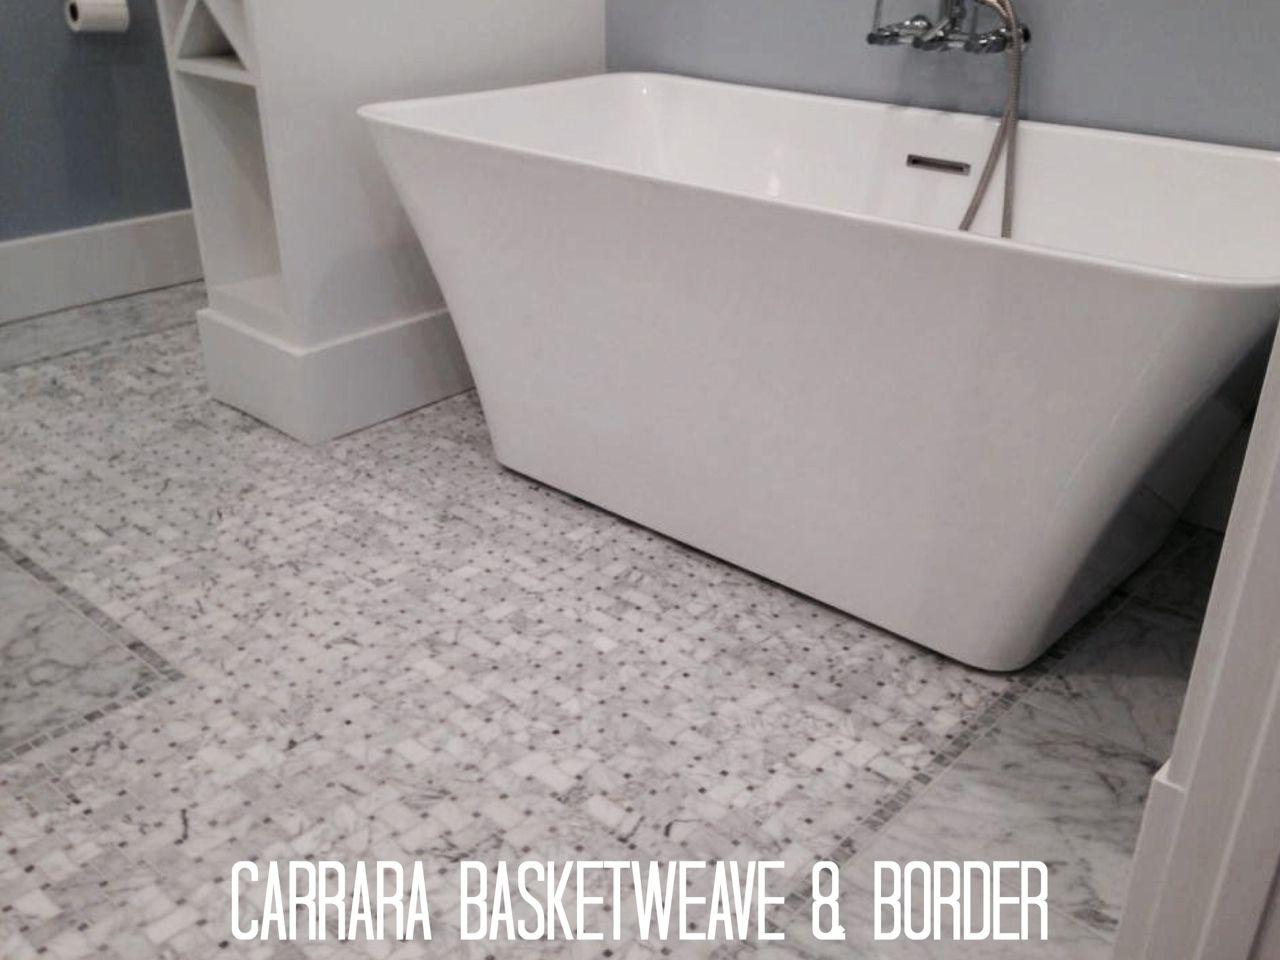 Basketweave tile bathroom pictures - Carrara Basketweave Mission Accomplished Lookout Mountain Tn Mission Stone Tile